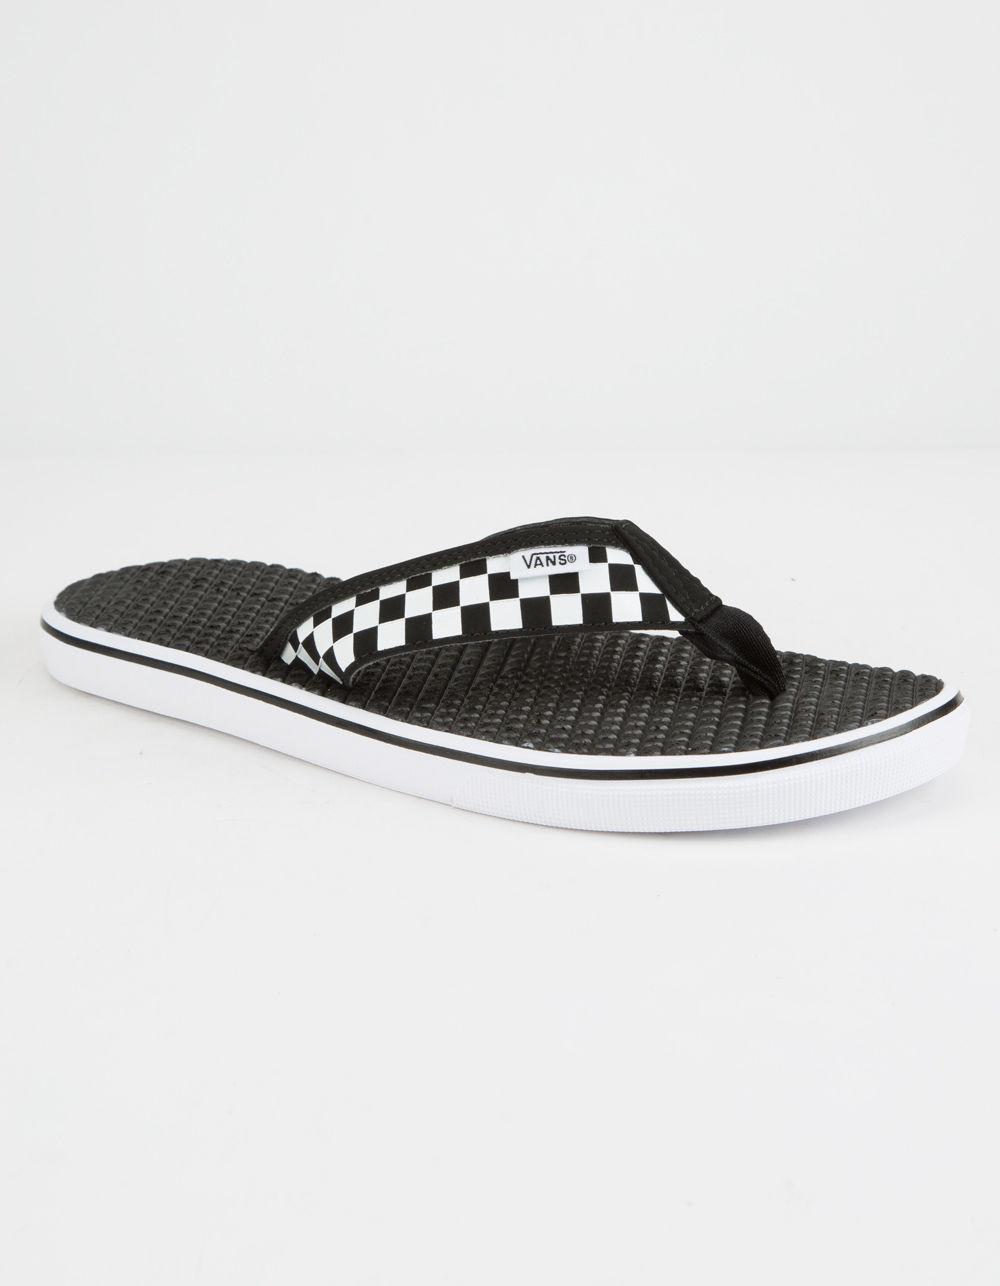 96b03a93605 Lyst - Vans La Costa Lite Mens Sandals in Black for Men